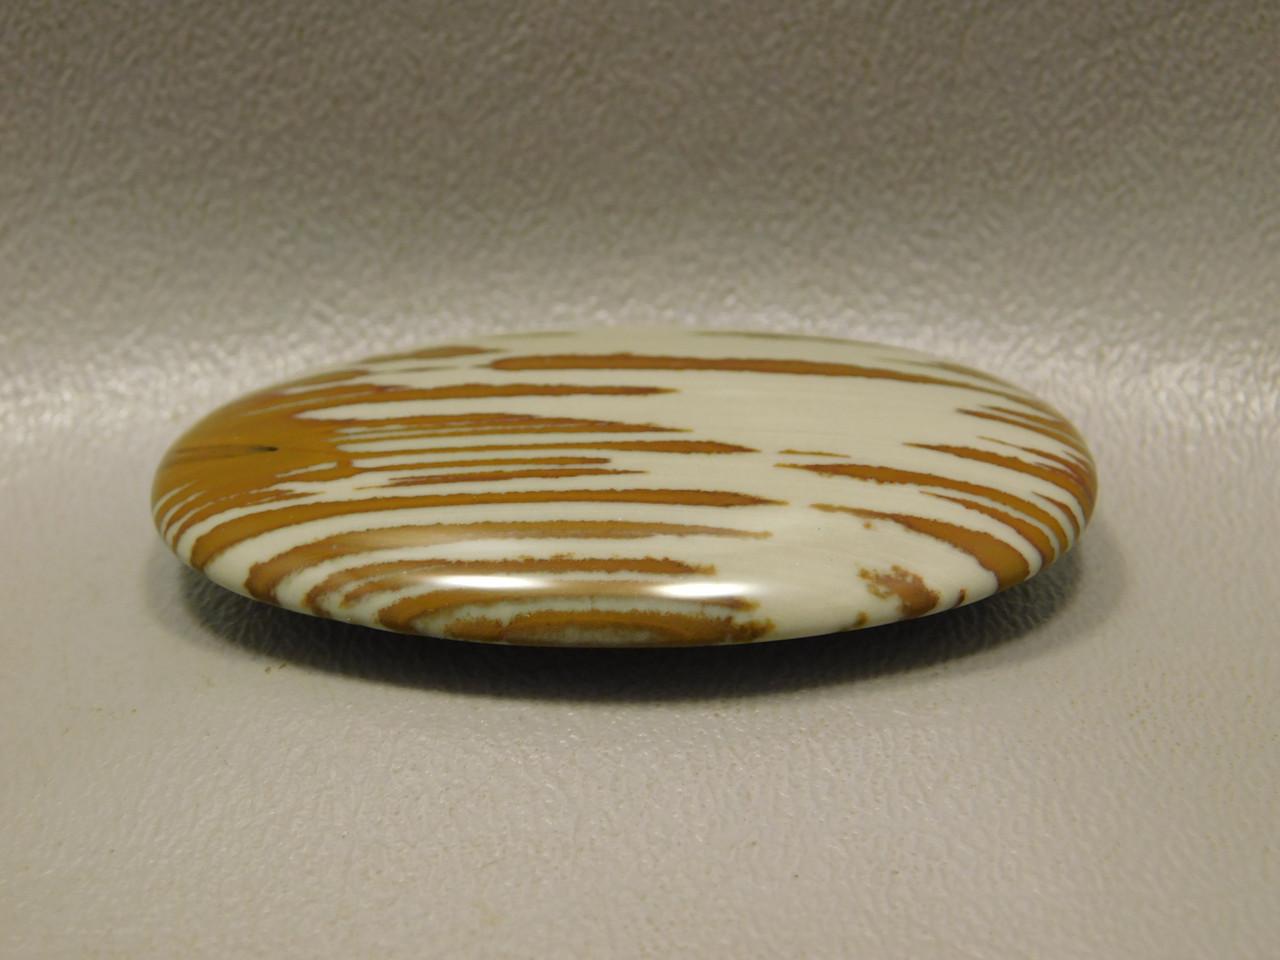 Stone Cabochon Oval Red Scenic Owyhee Picture Jasper #8